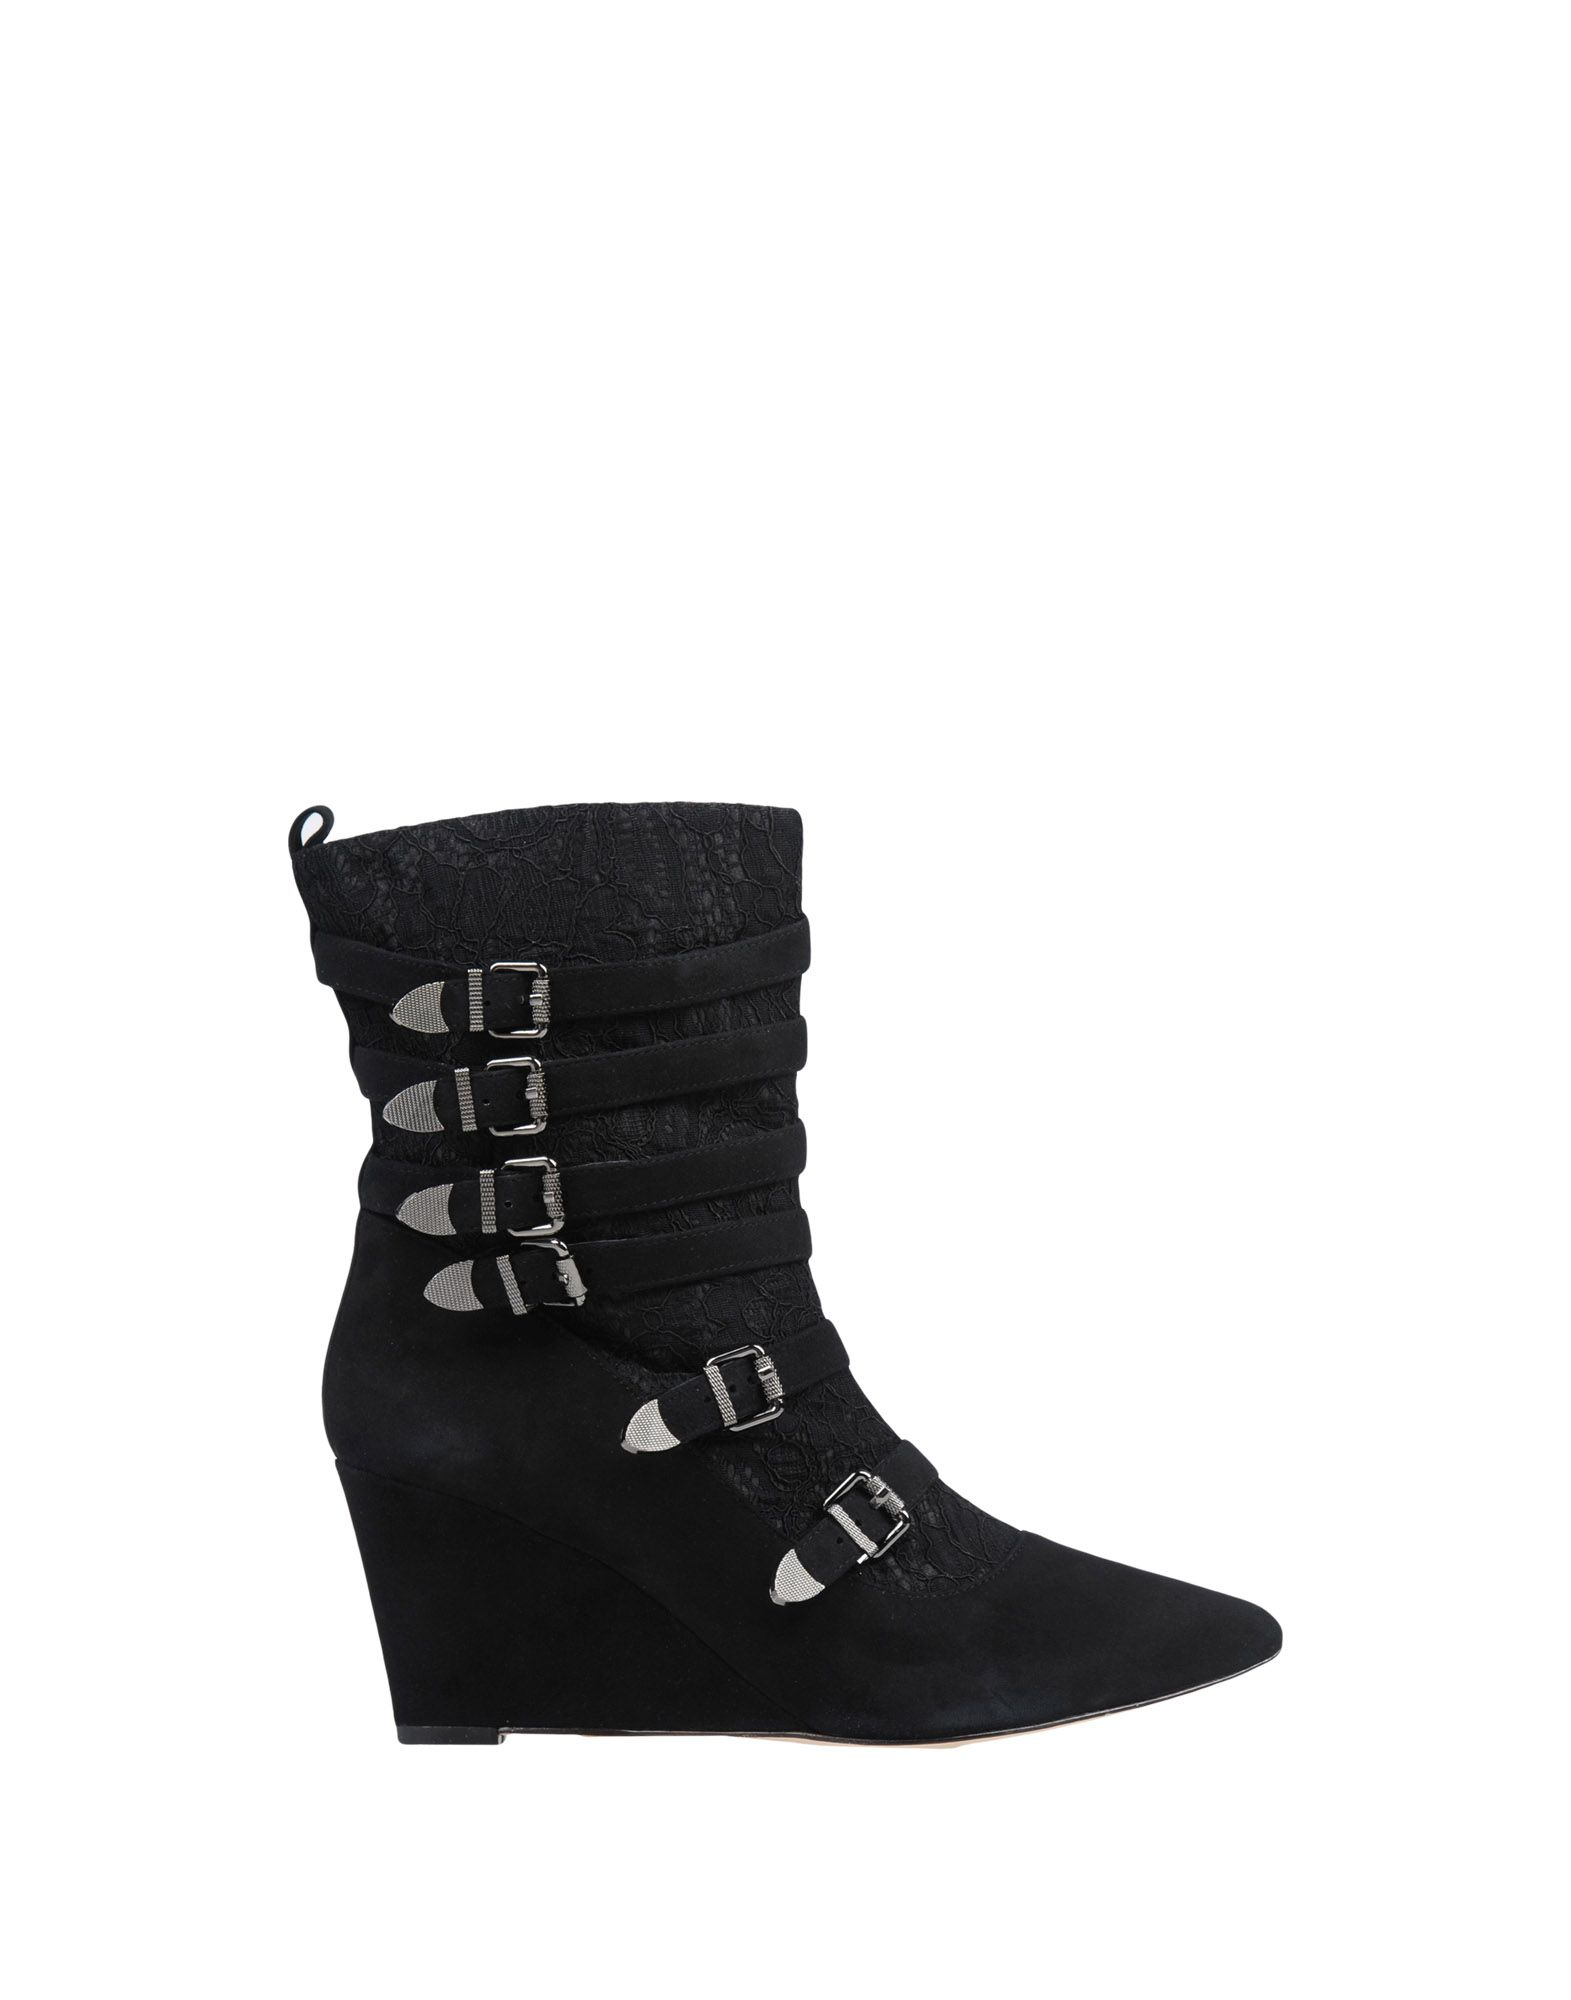 LUCY CHOI London Полусапоги и высокие ботинки lucy choi ботинки